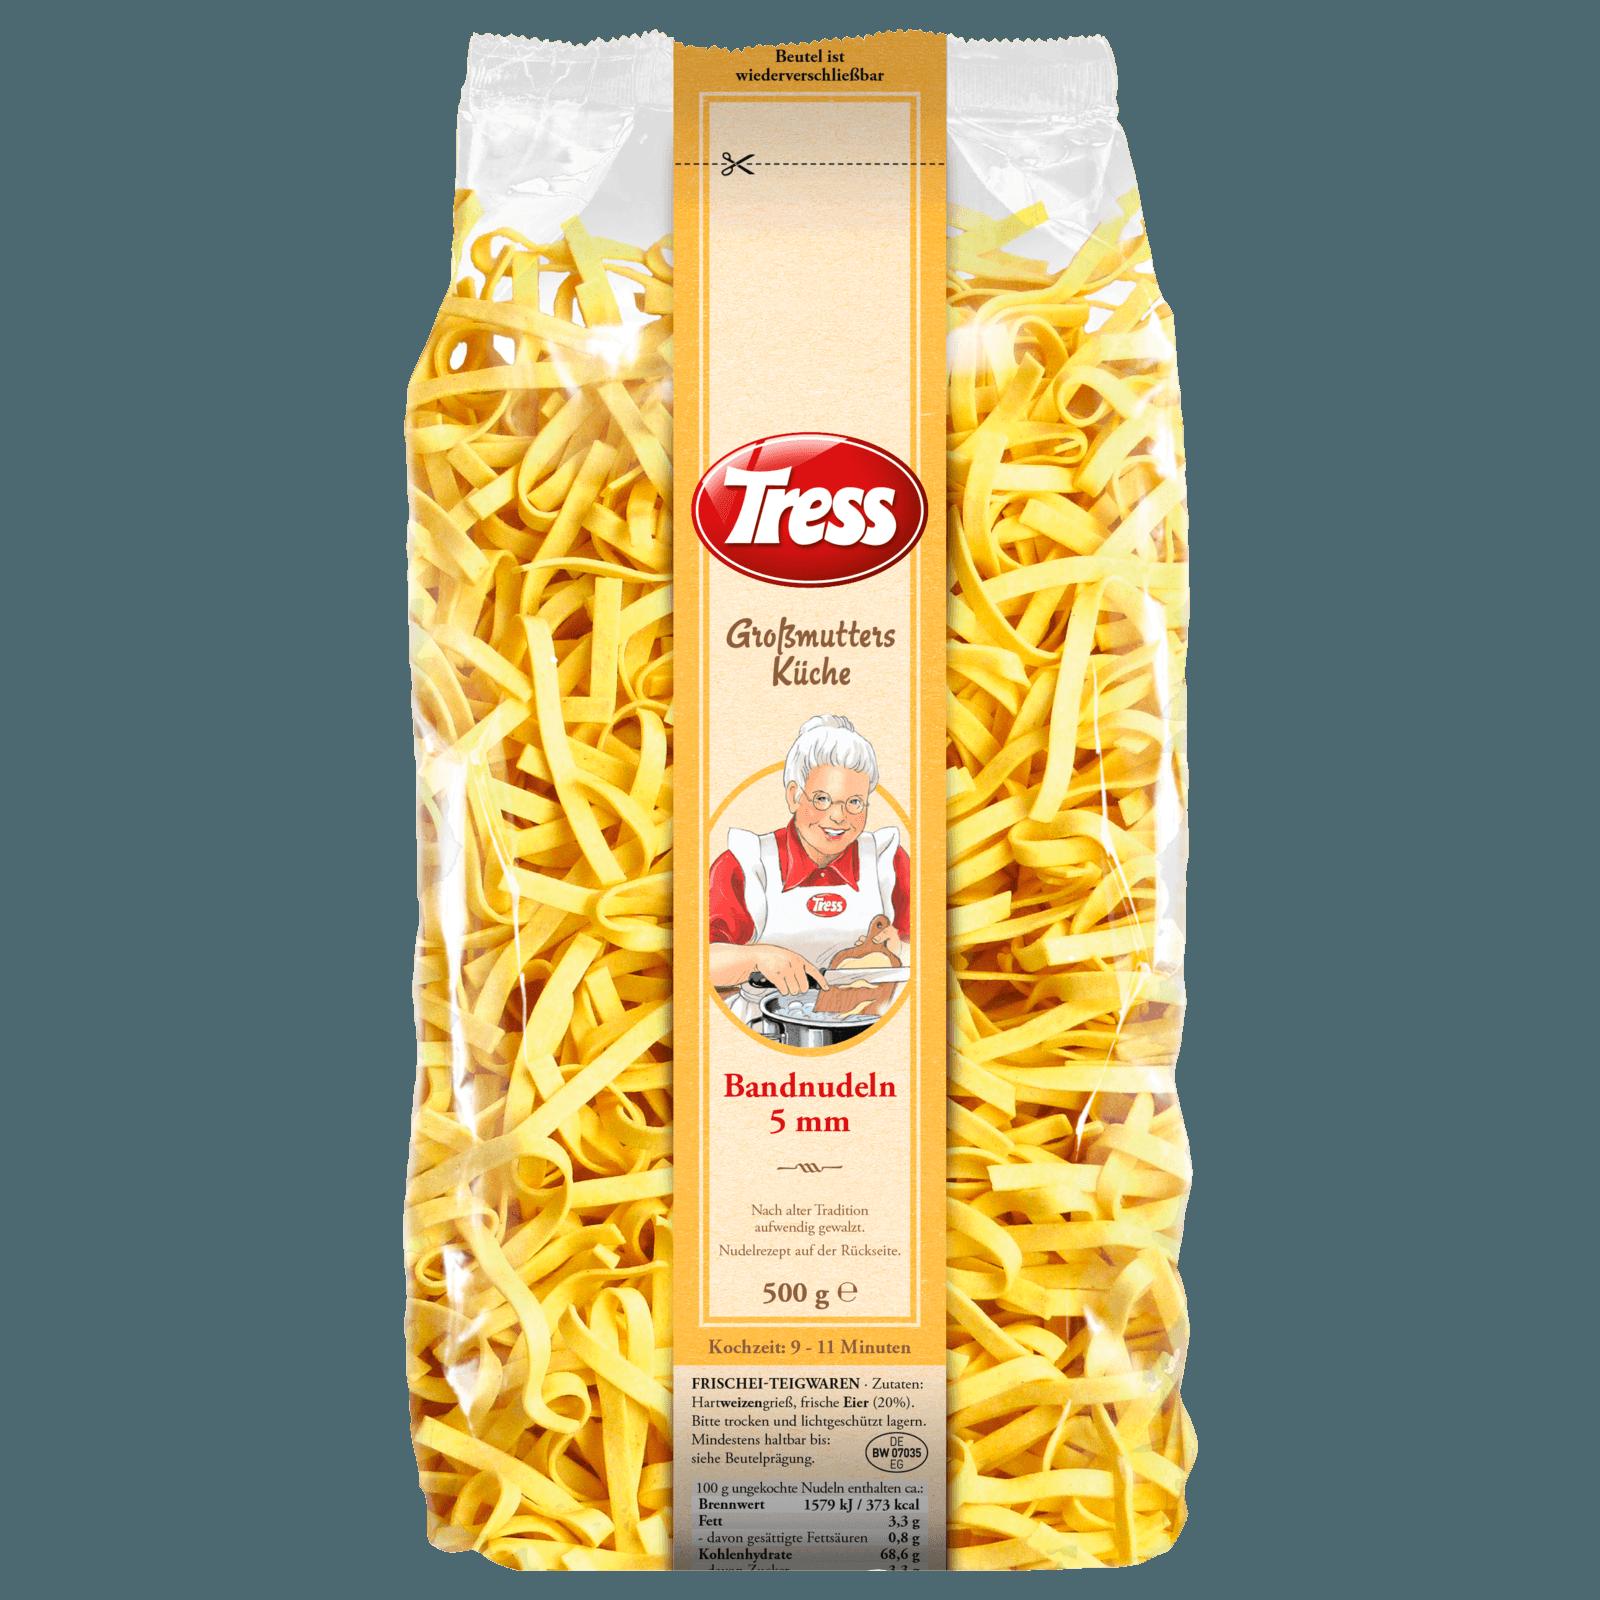 Tress Großmutters Küche Bandnudeln 5mm 500g